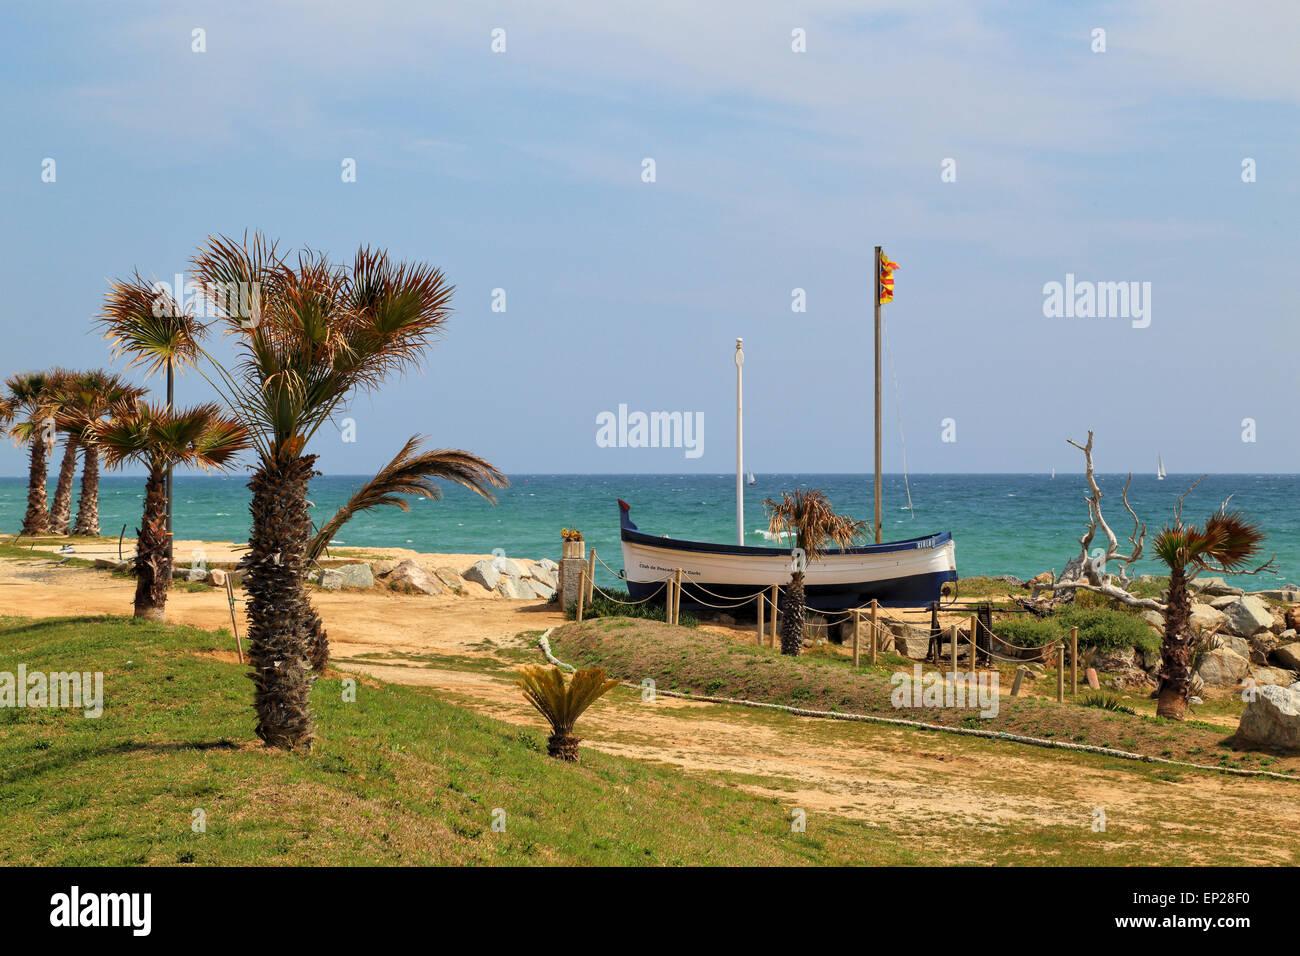 Beach of Vilassar de Mar, near Barcelona, Spain - Stock Image